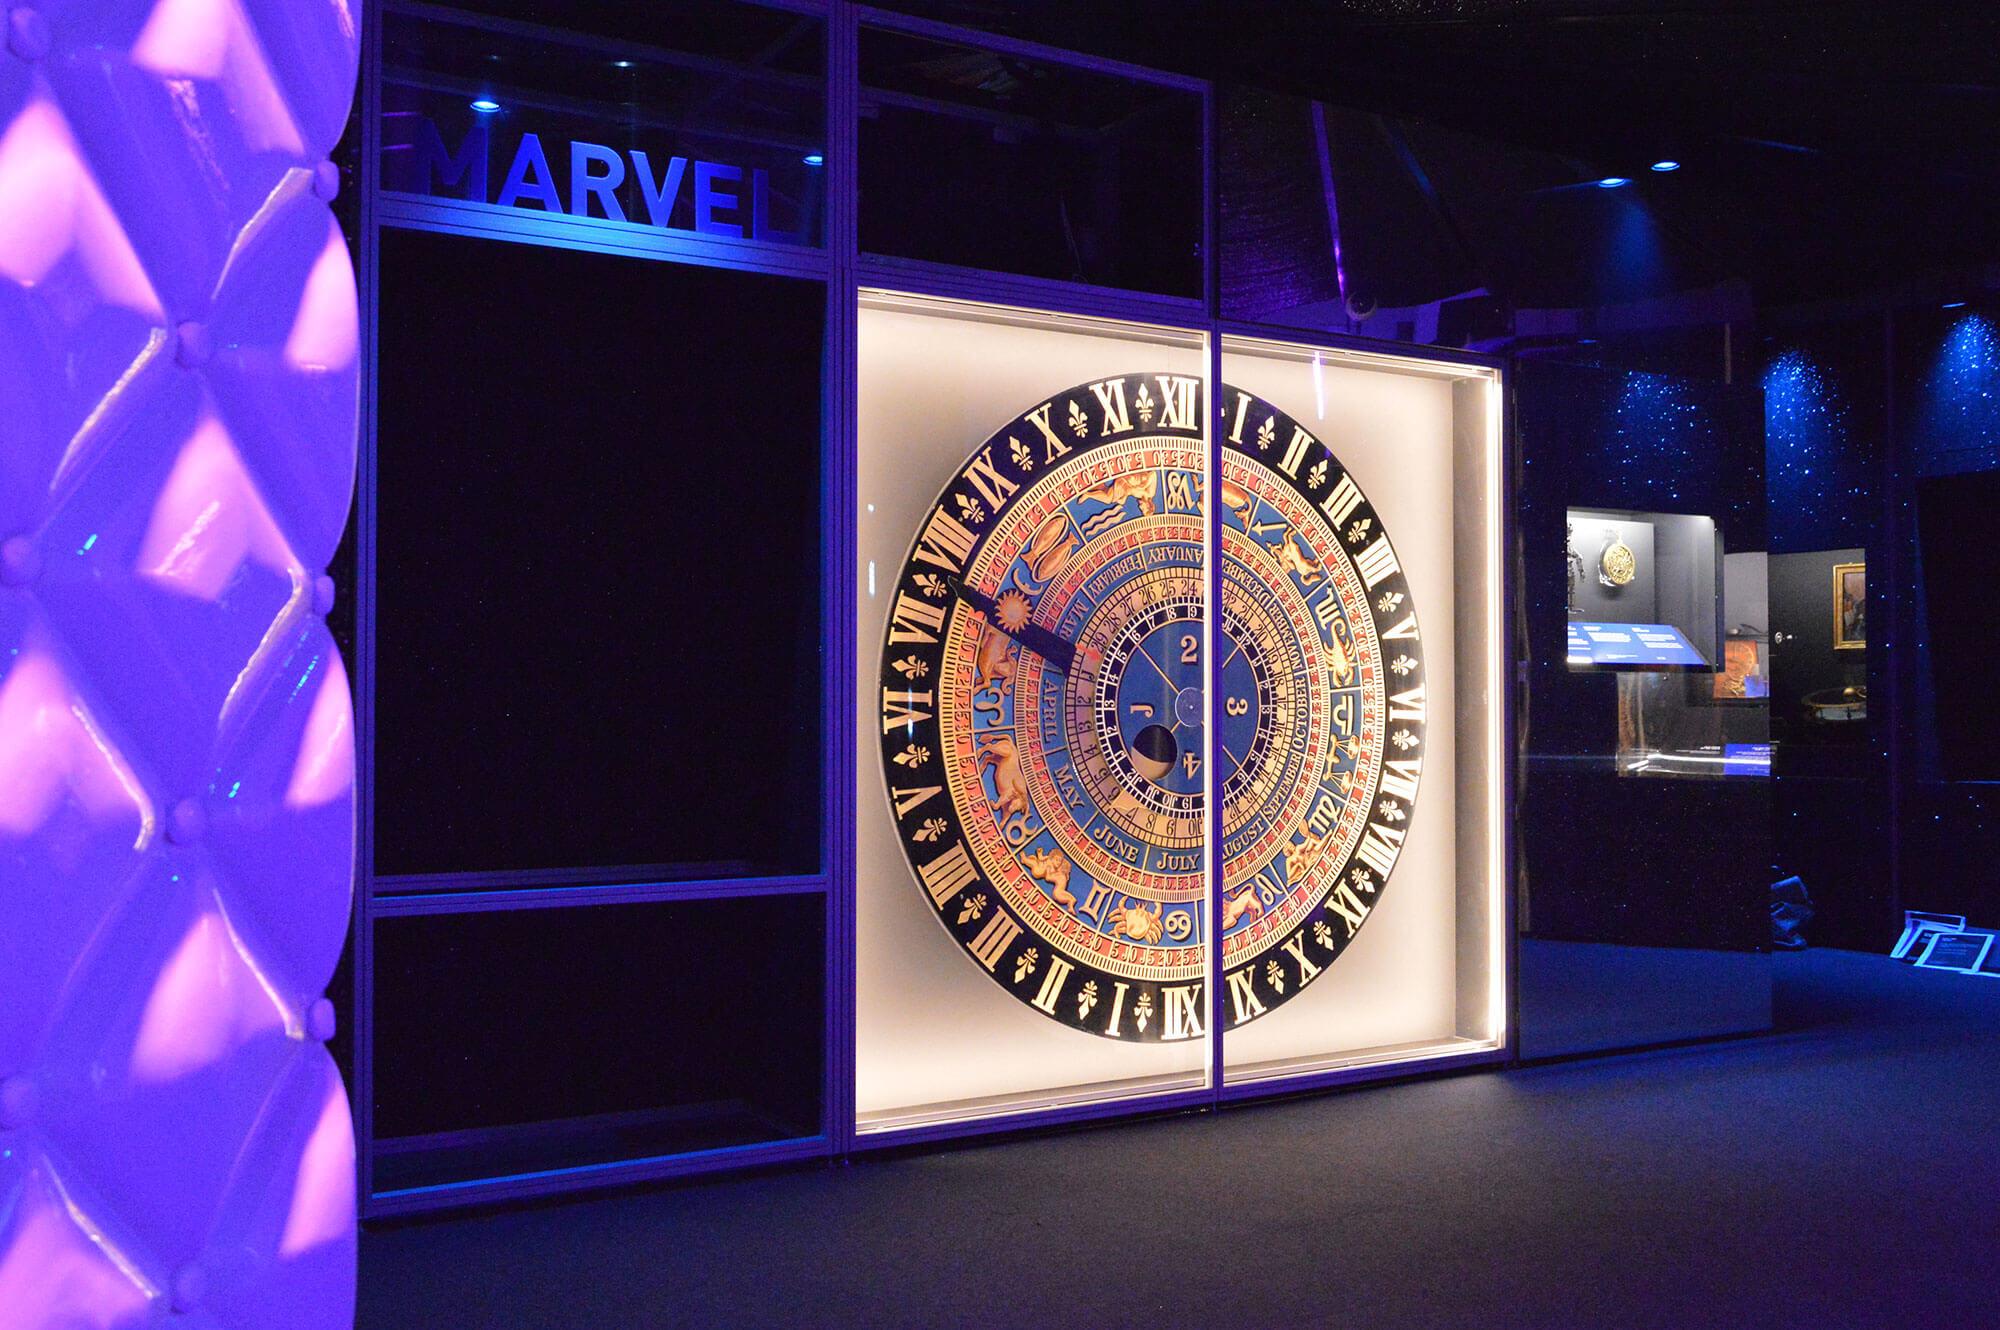 robots-science-museum-3-mjlighting